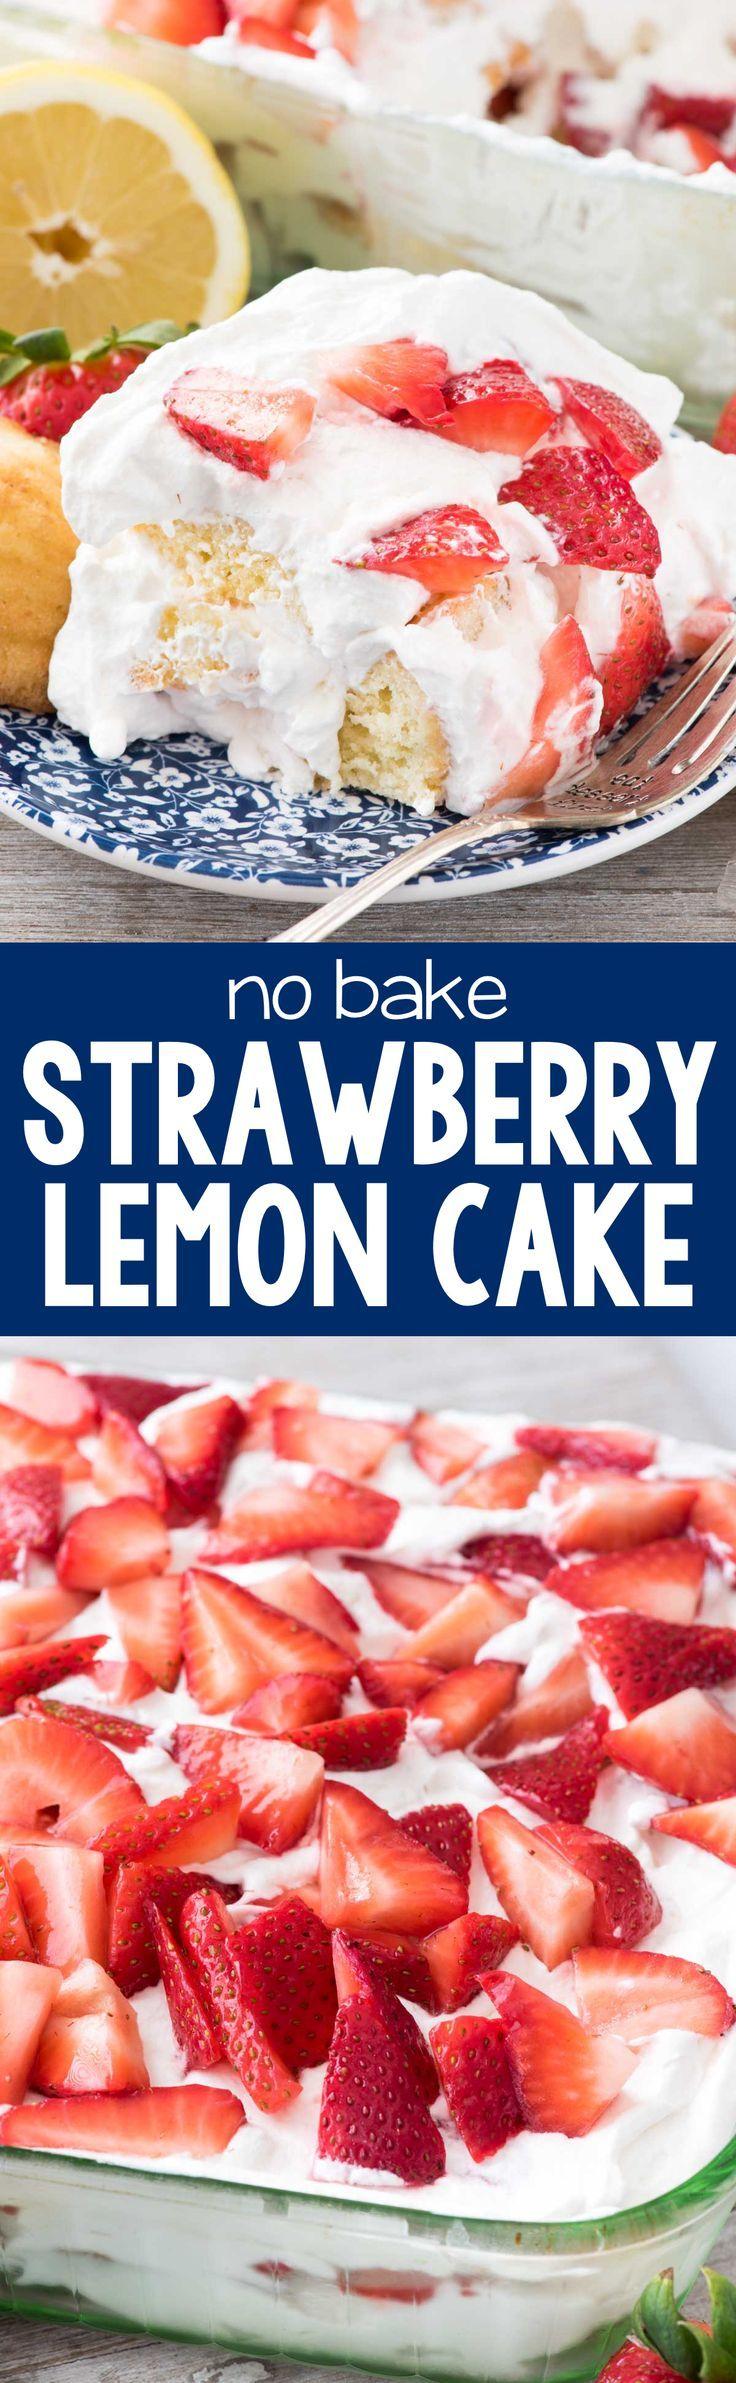 No Bake Strawberry Lemon Cake - this easy lemon cake recipe starts with lemon madeleines and is full of fresh lemon whipped cream and strawberries!